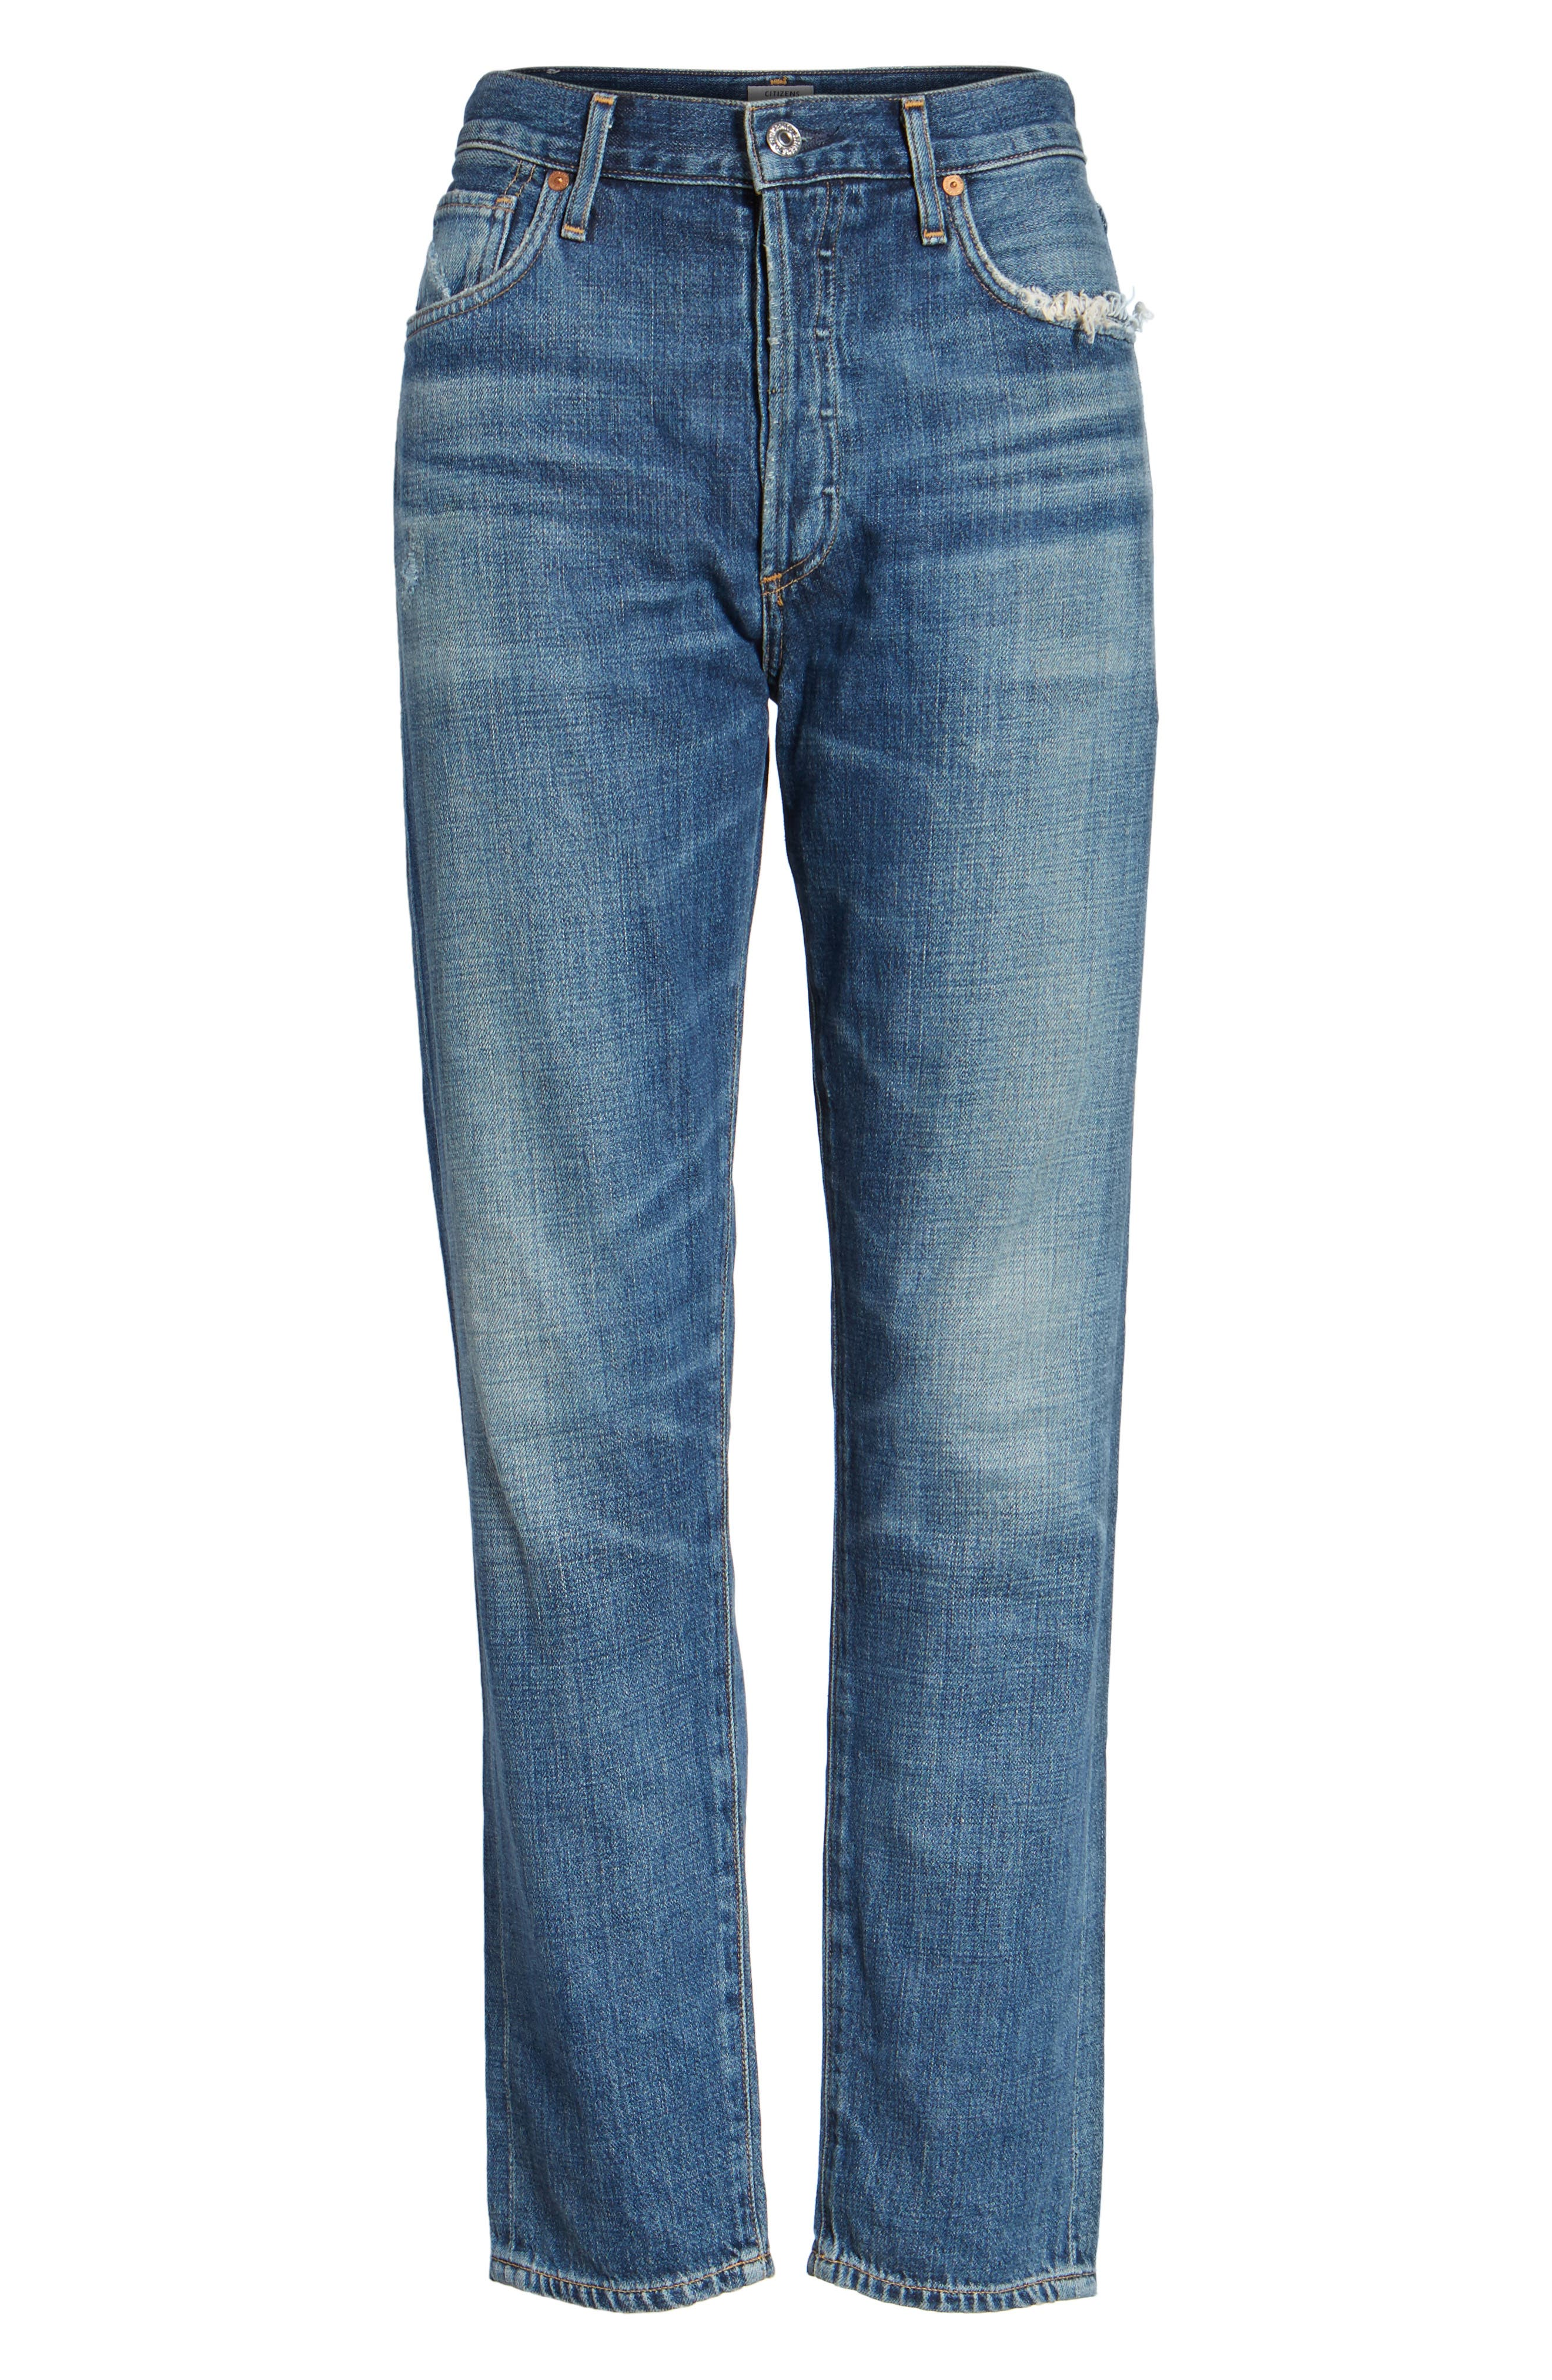 Liya High Waist Slim Boyfriend Jeans,                         Main,                         color, 426